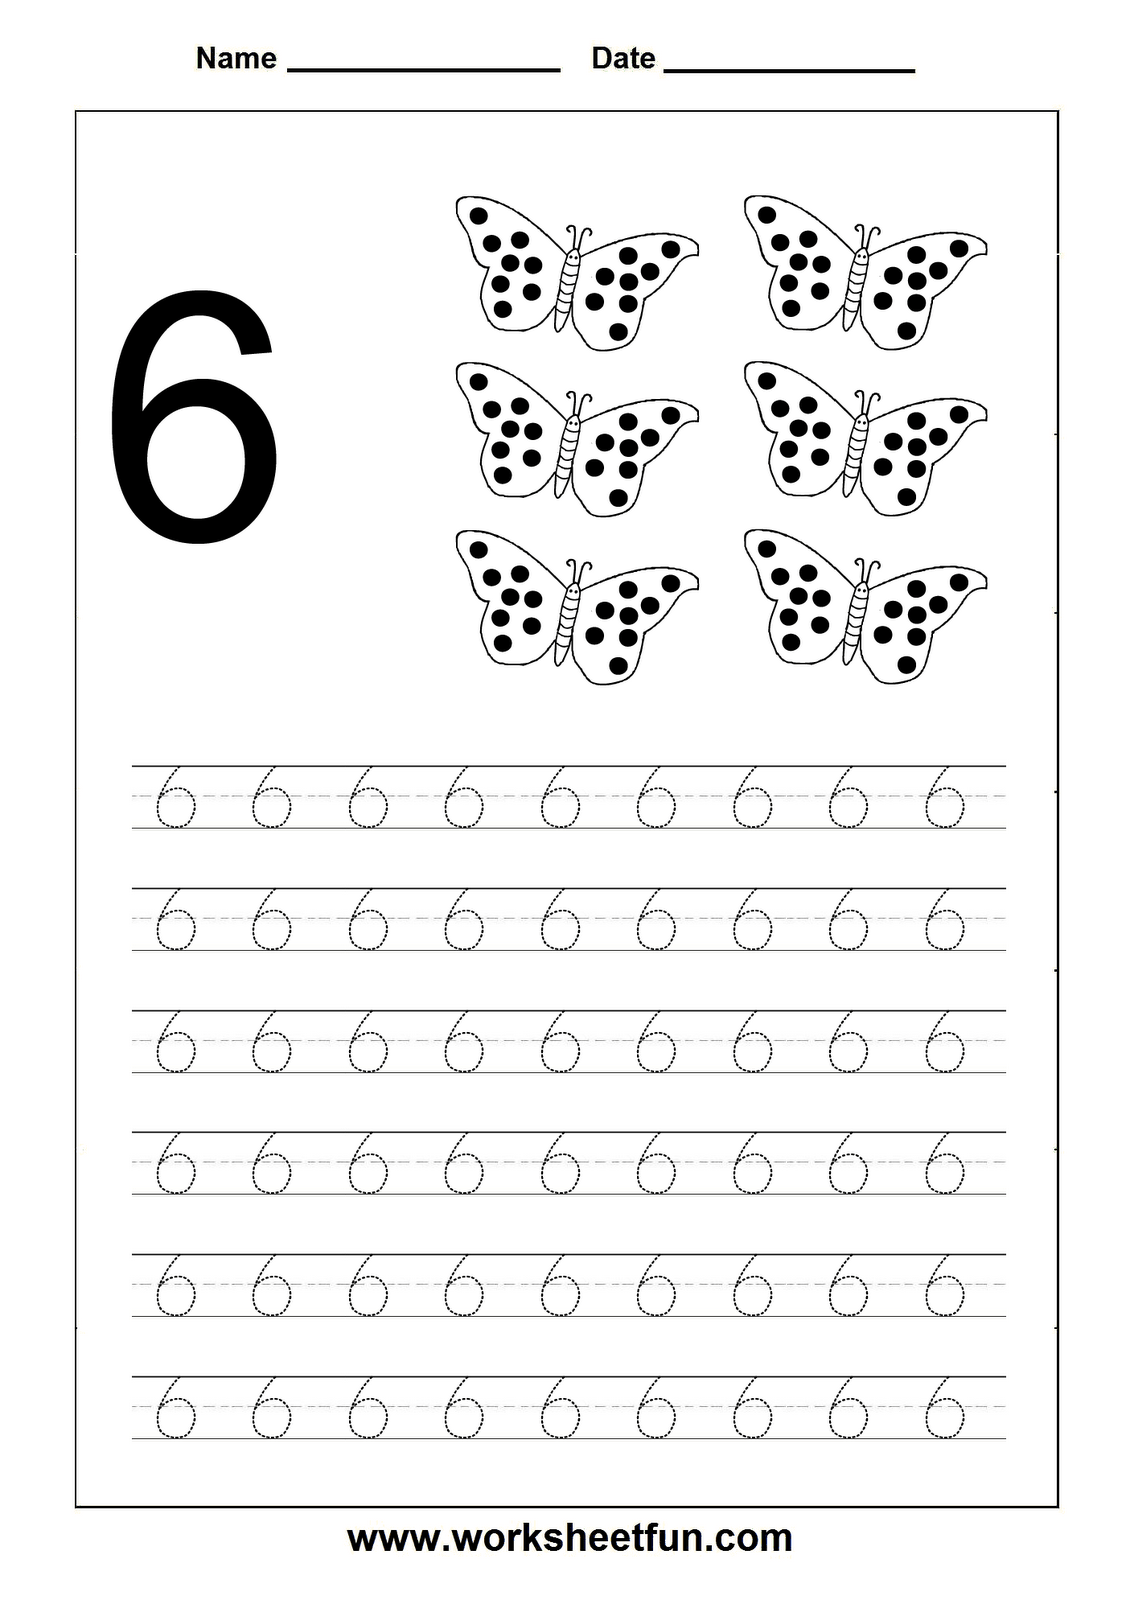 Number 6 Tracing Worksheets